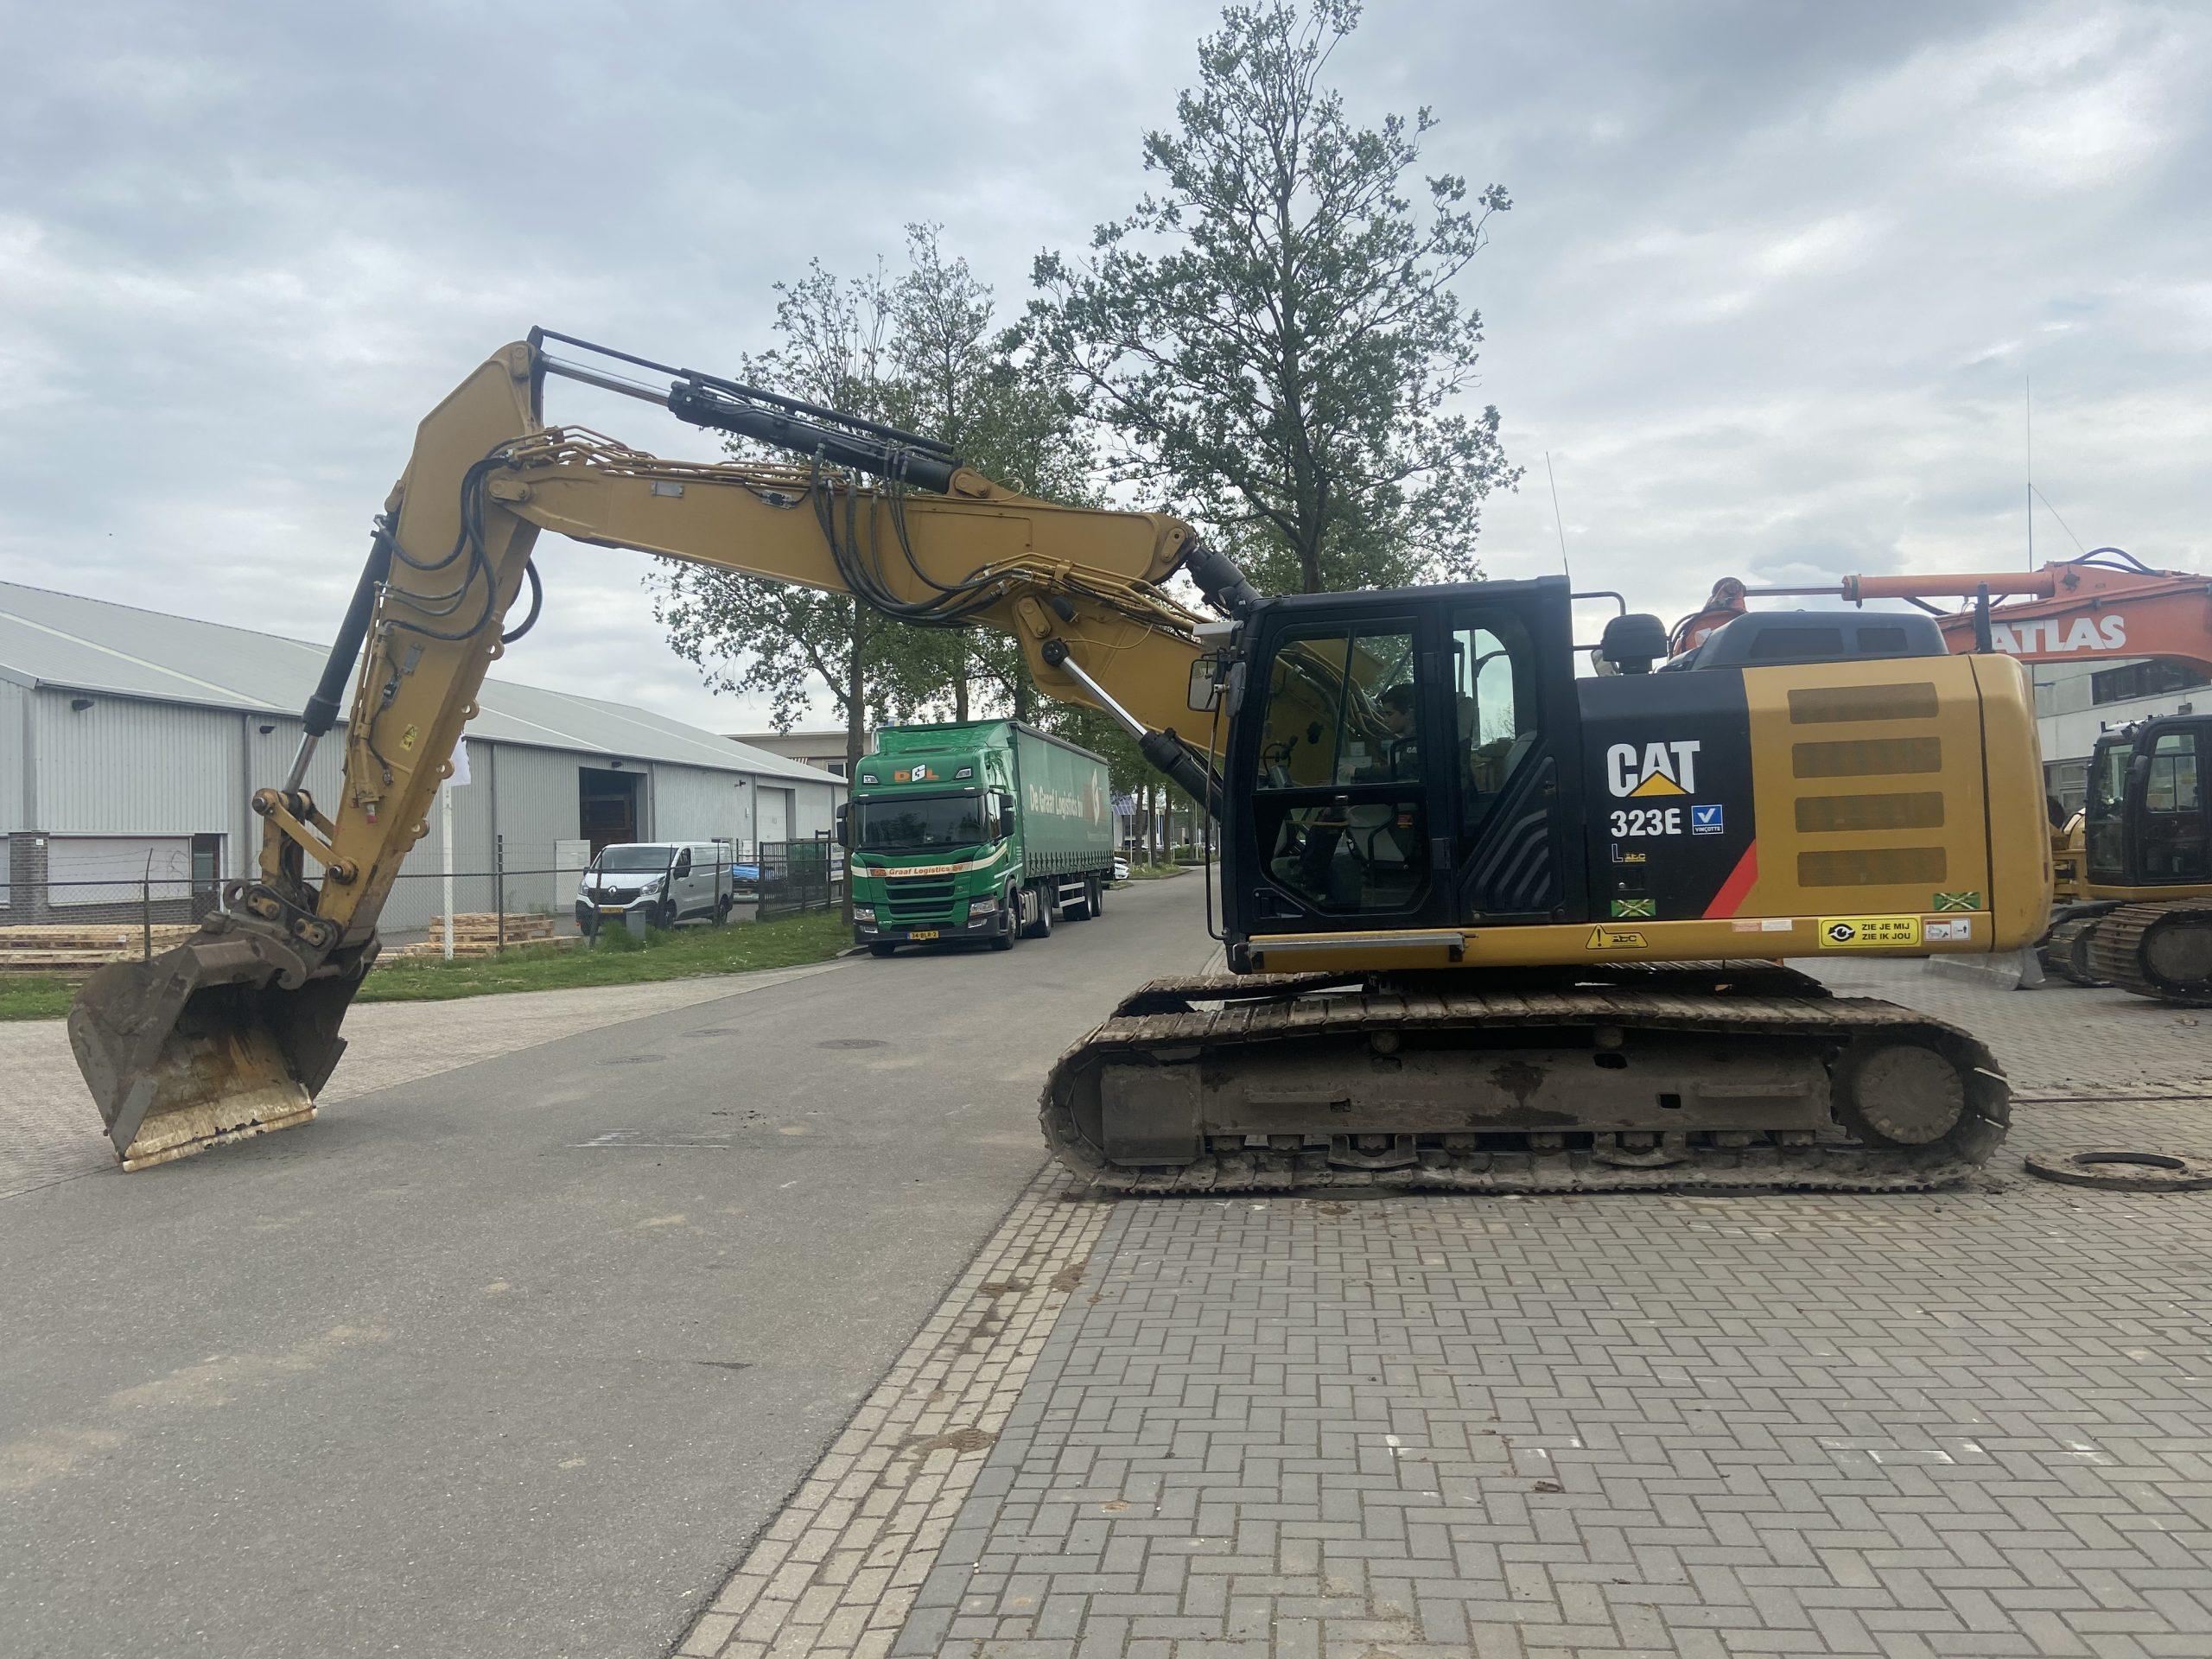 Caterpillar 323 E L VA